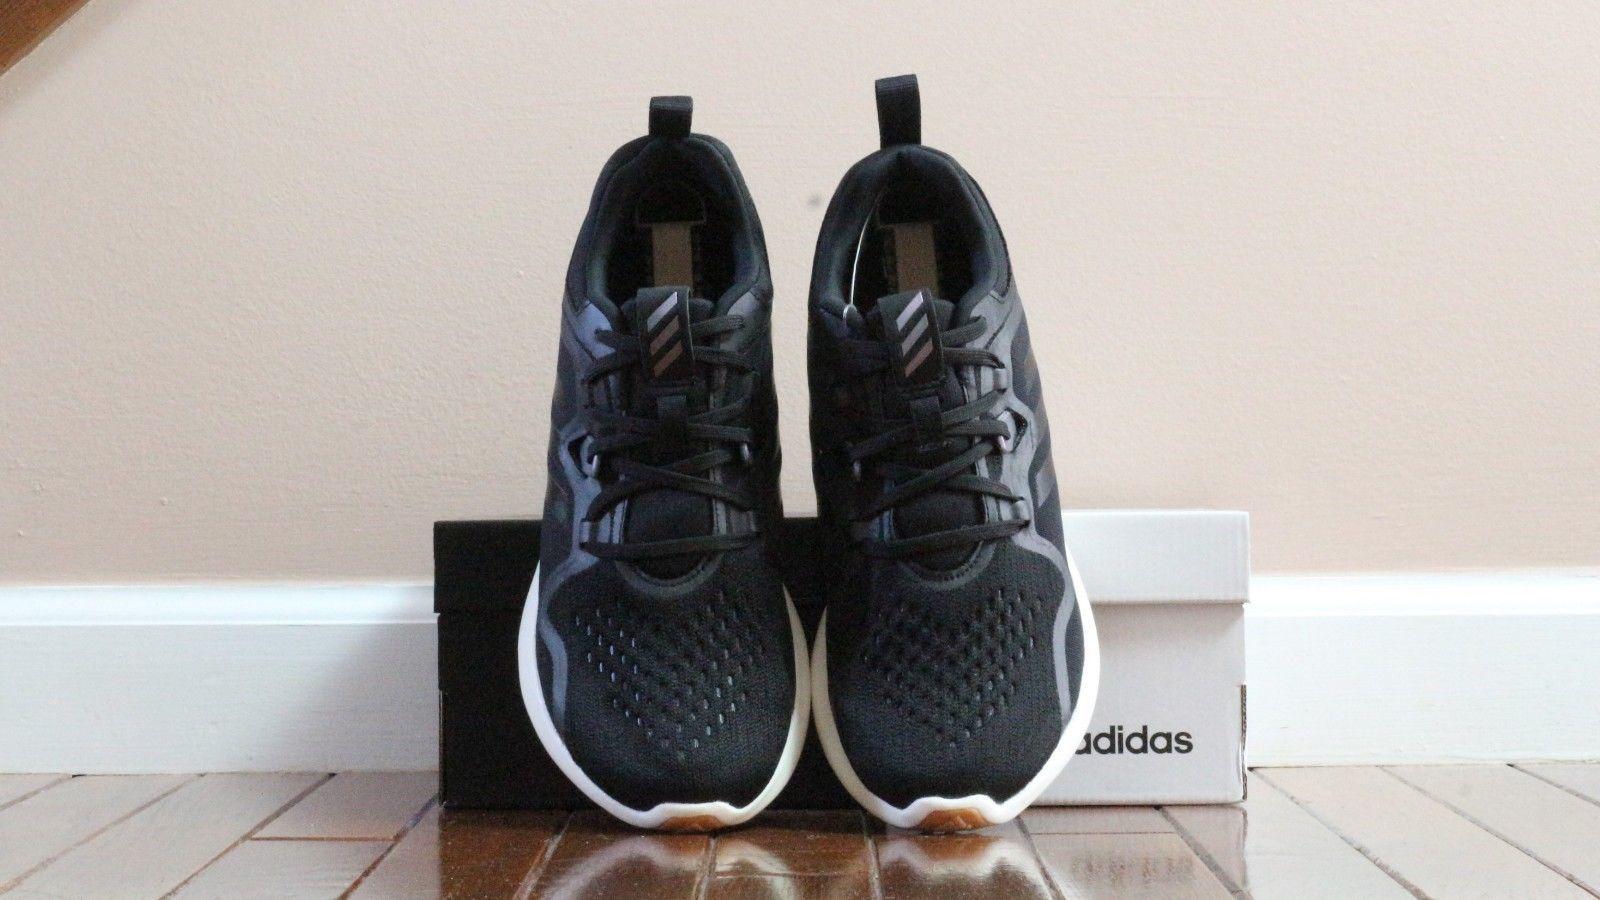 Adidas Women's Size 9 Edgebounce Running Shoe BB7566 Black